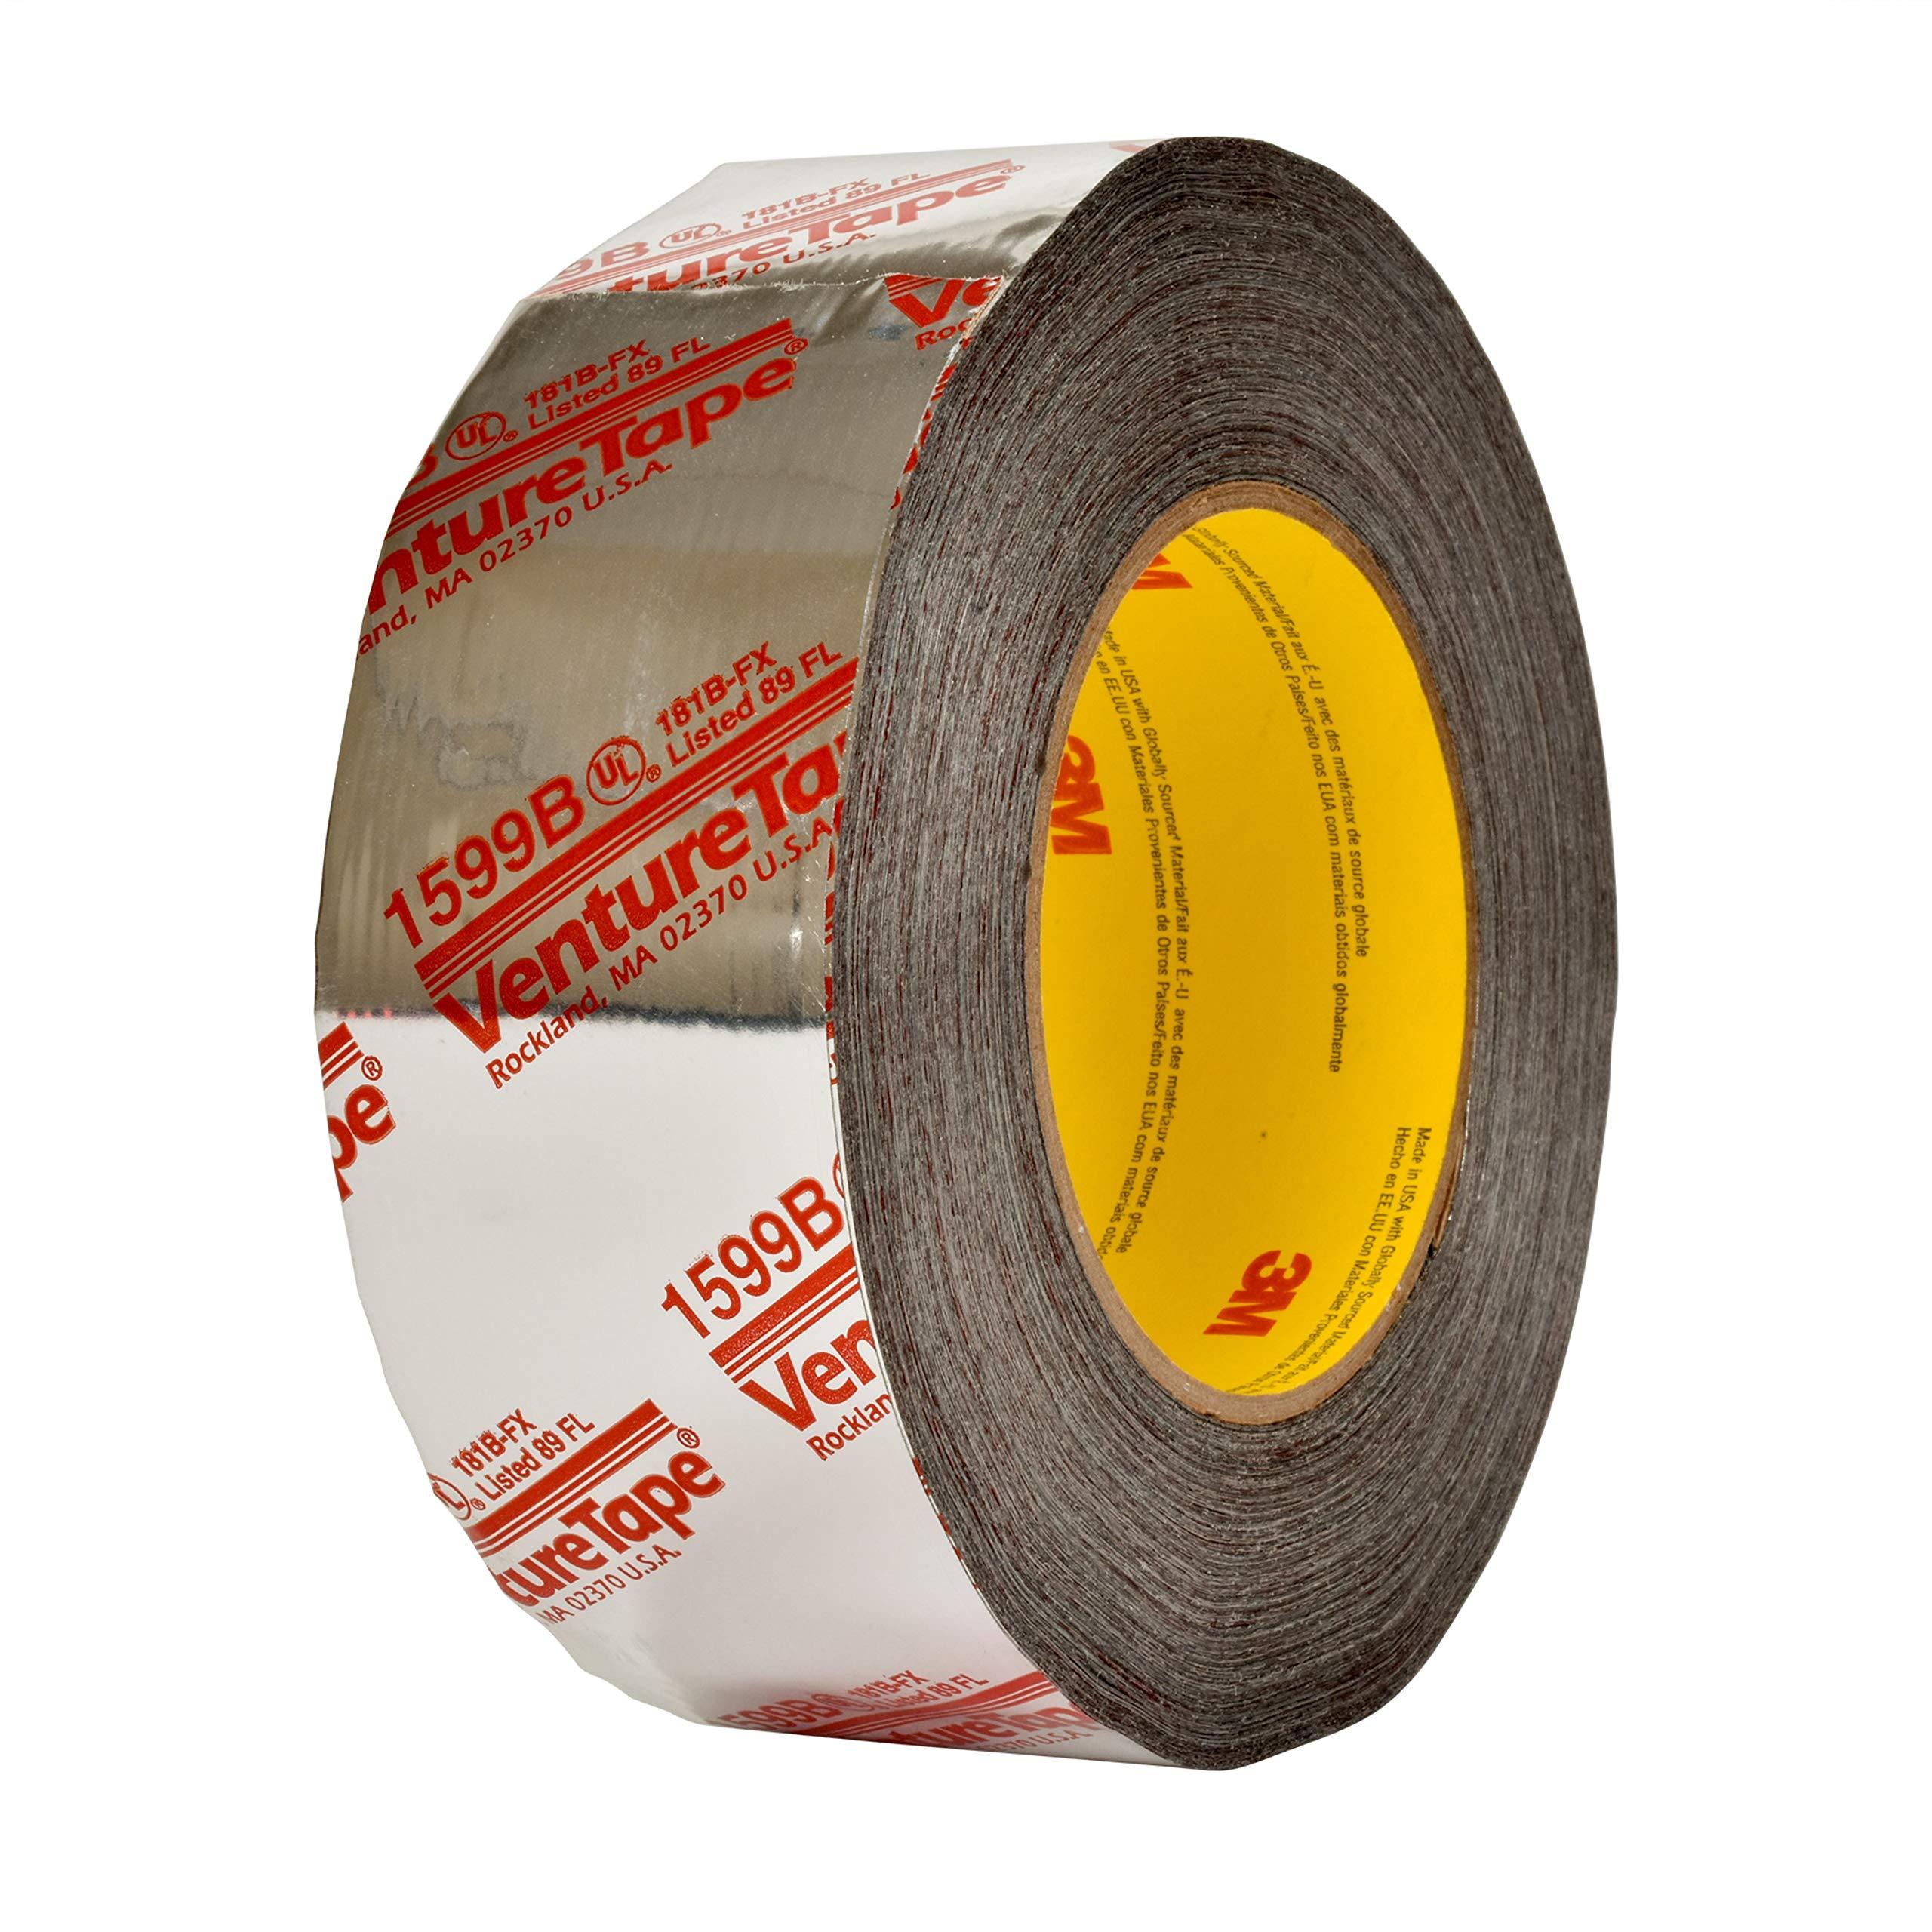 3M Venture Tape UL181B-FX Polypropylene Duct Tape 1599B Silver, 48 mm x 109.7 m 3 mil (Pack of 24)